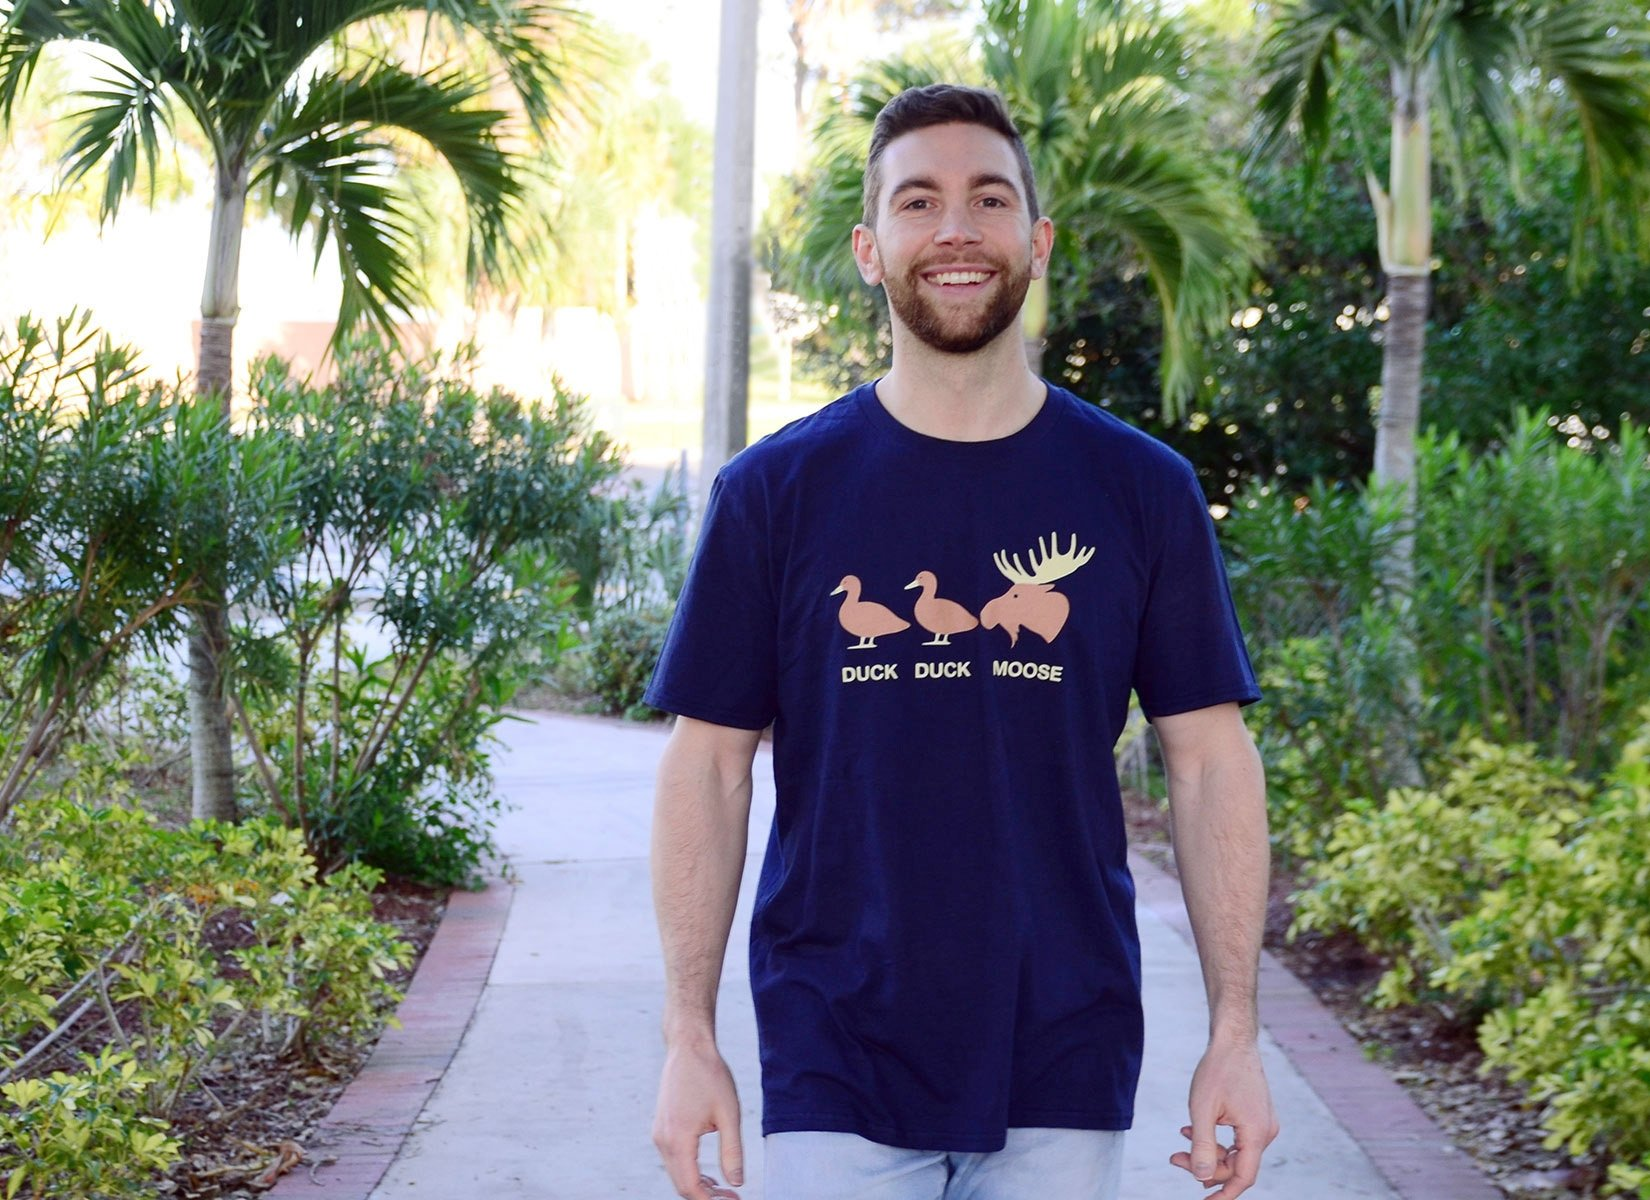 Duck Duck Moose on Mens T-Shirt